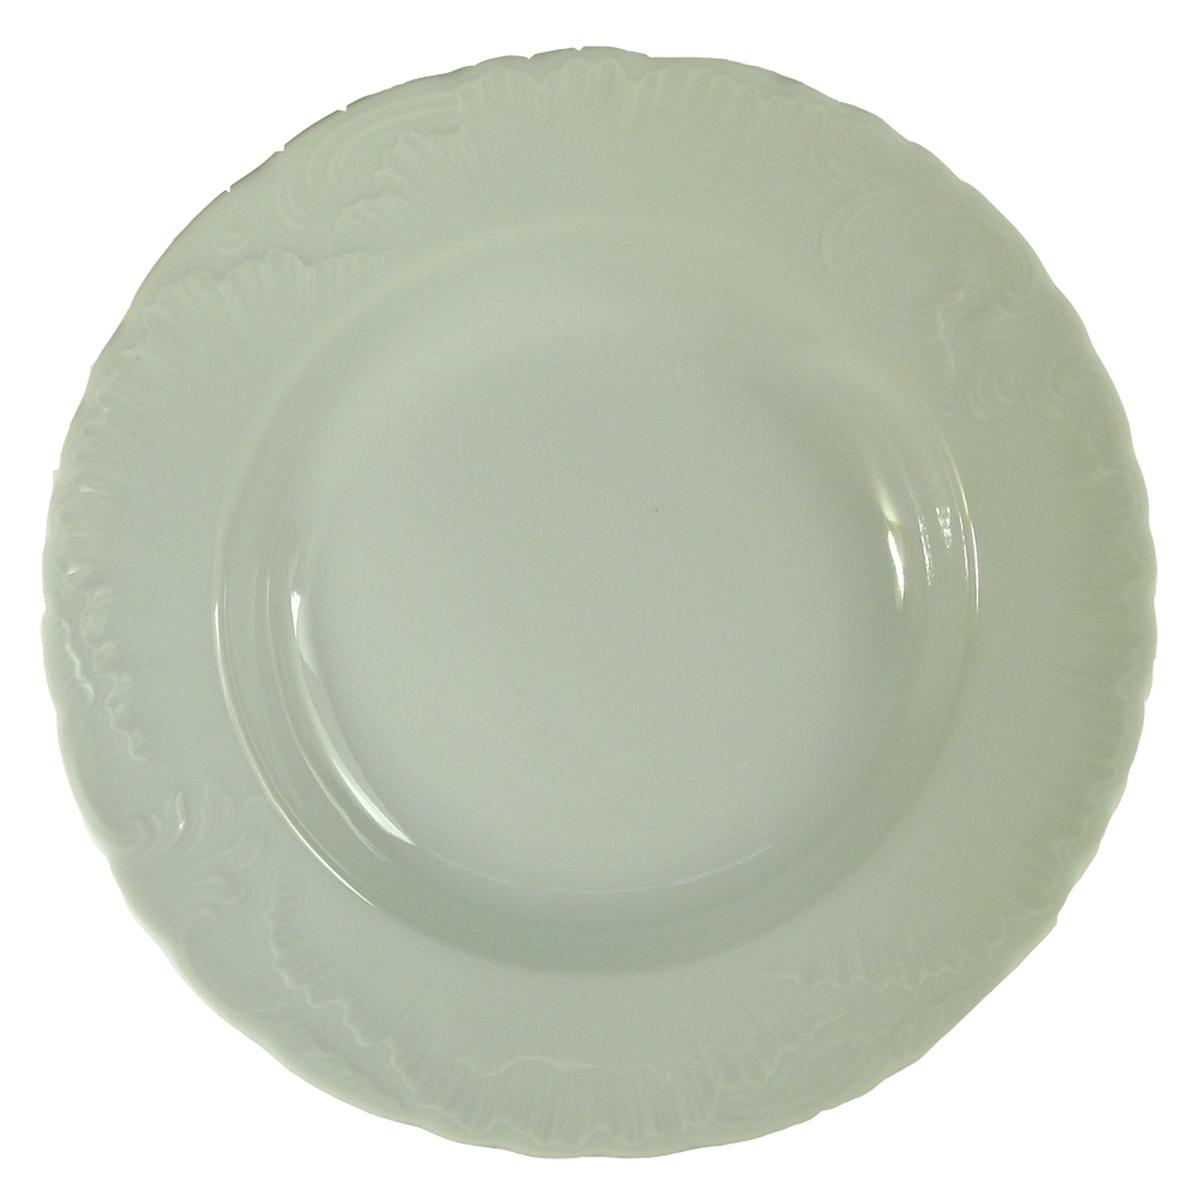 Фото - Тарелка глубокая Cmielow Rococo, диаметр 22,5 см тарелка десертная cmielow rococo диаметр 17 см